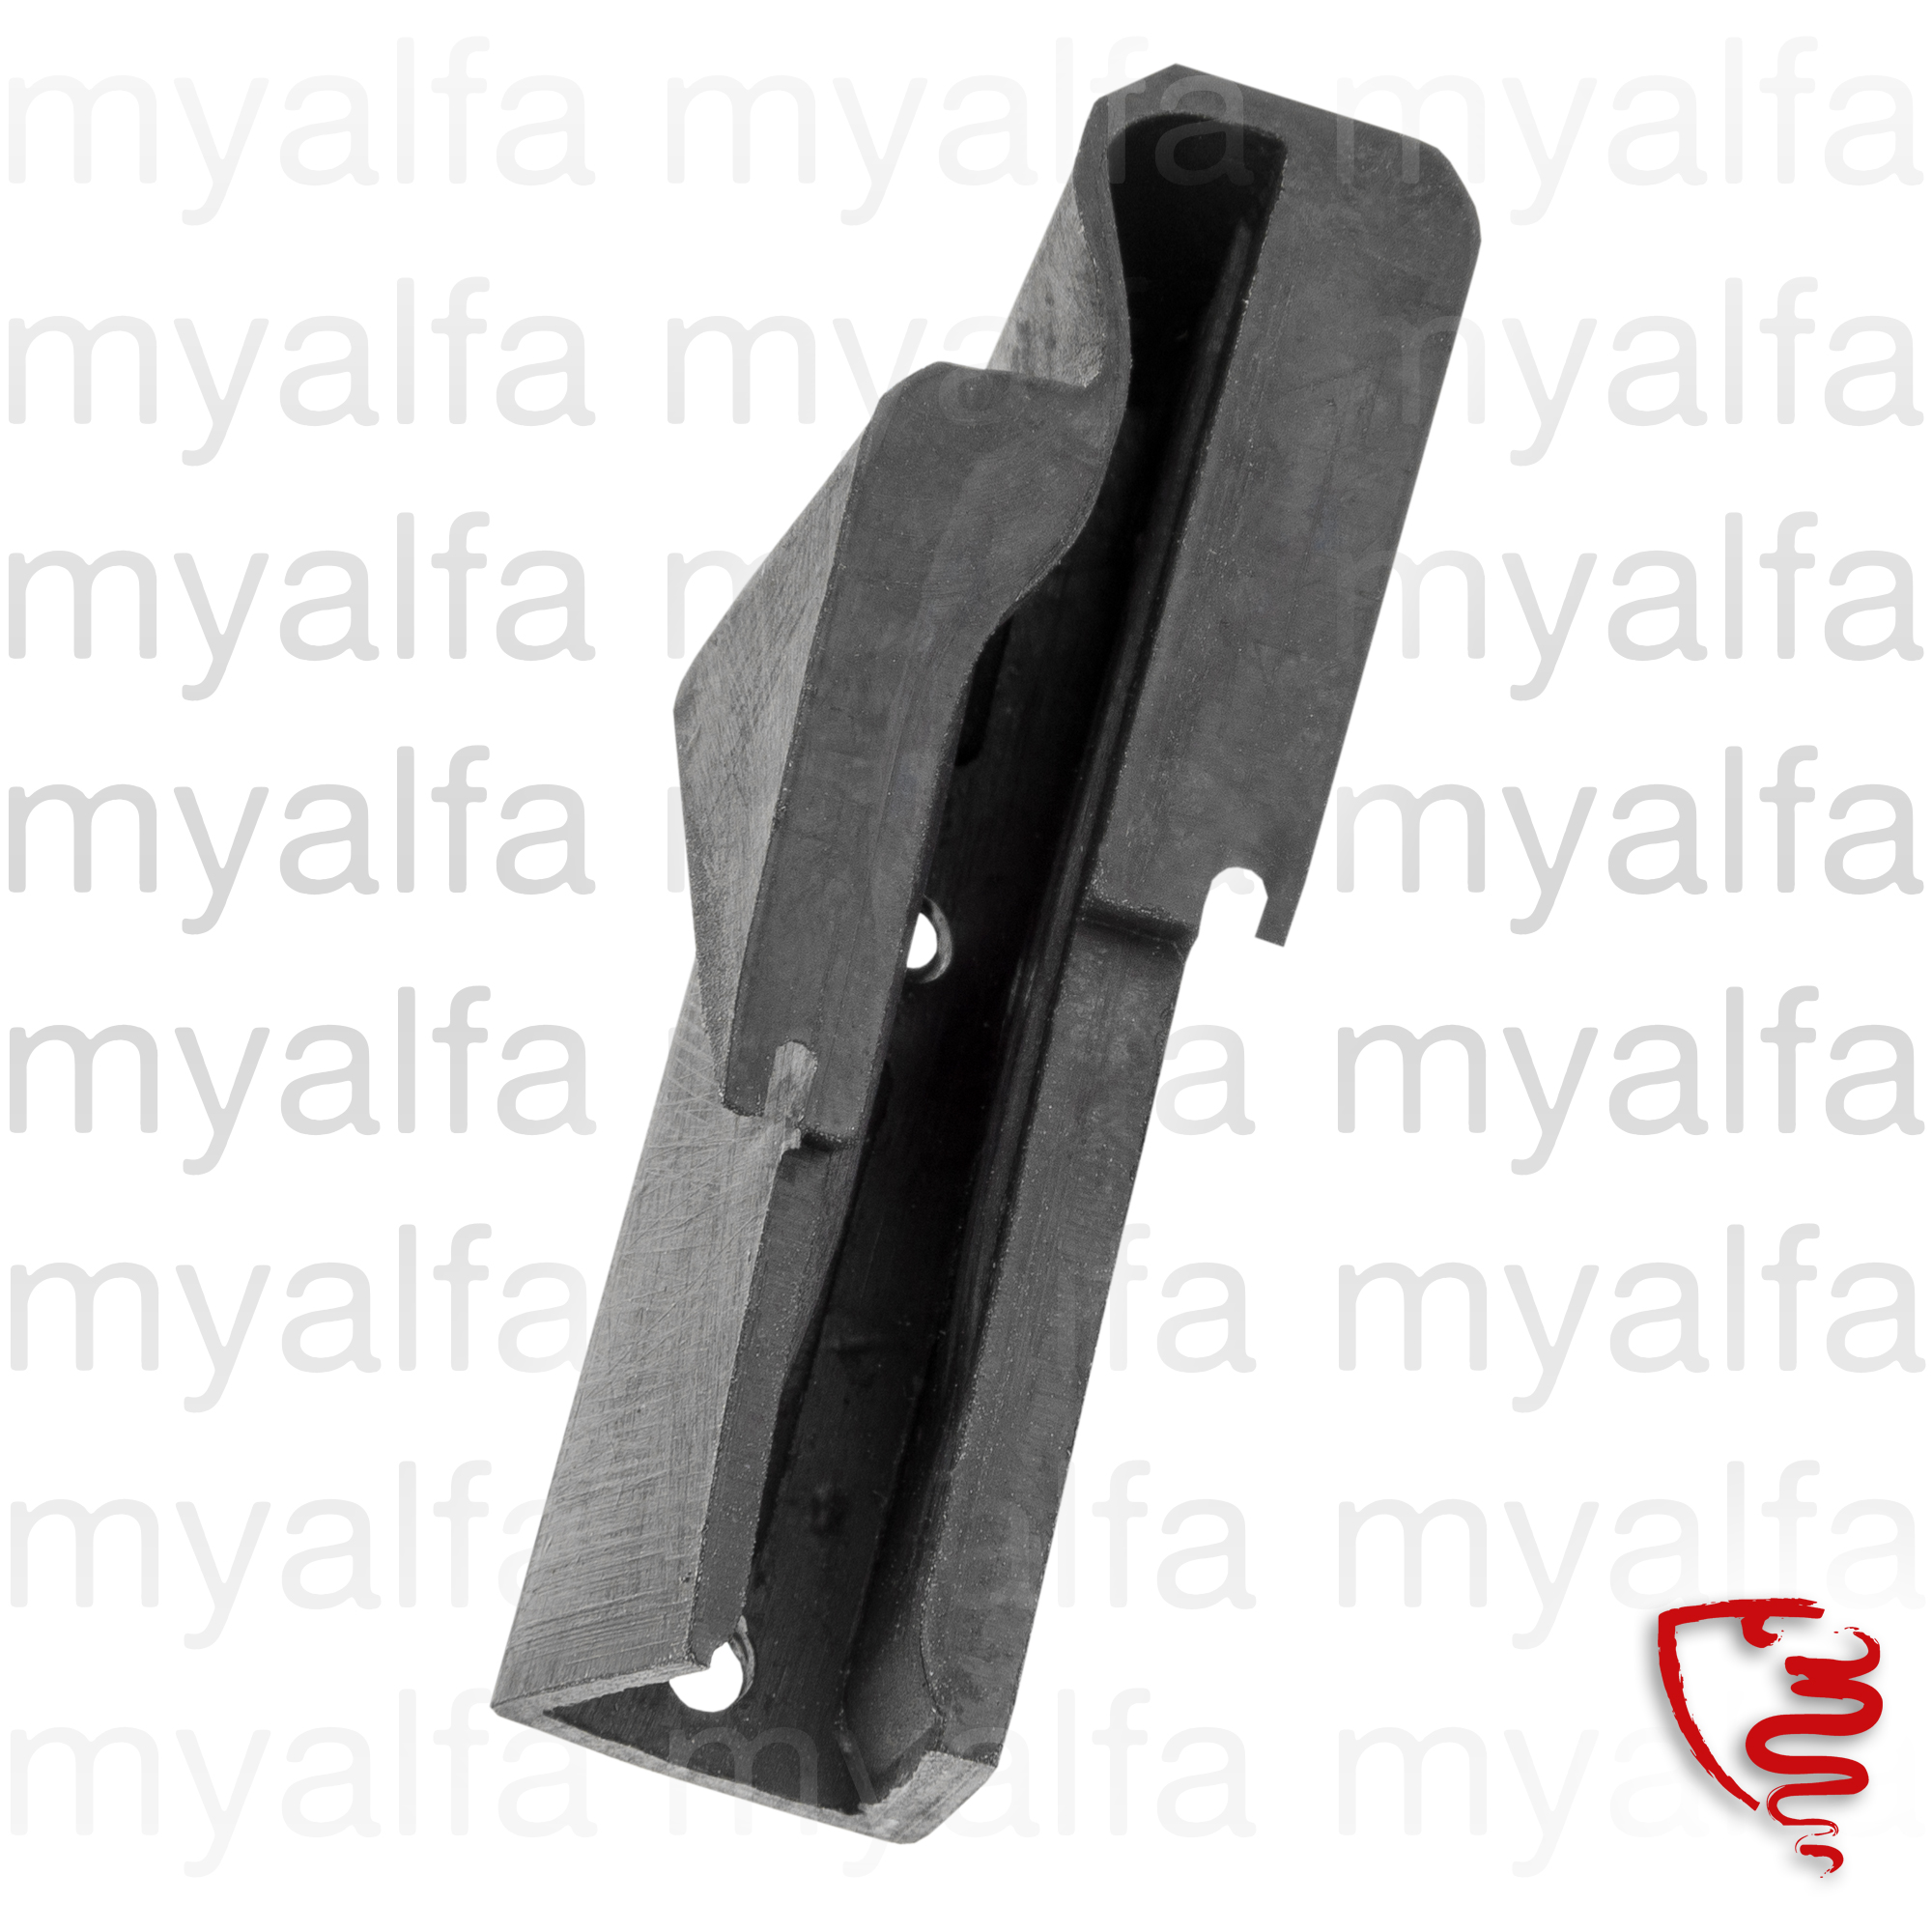 Triangle trough sealing door GT - disc. for 105/115, Coupe, Body parts, Rubber parts, Door grommets/felt/seals